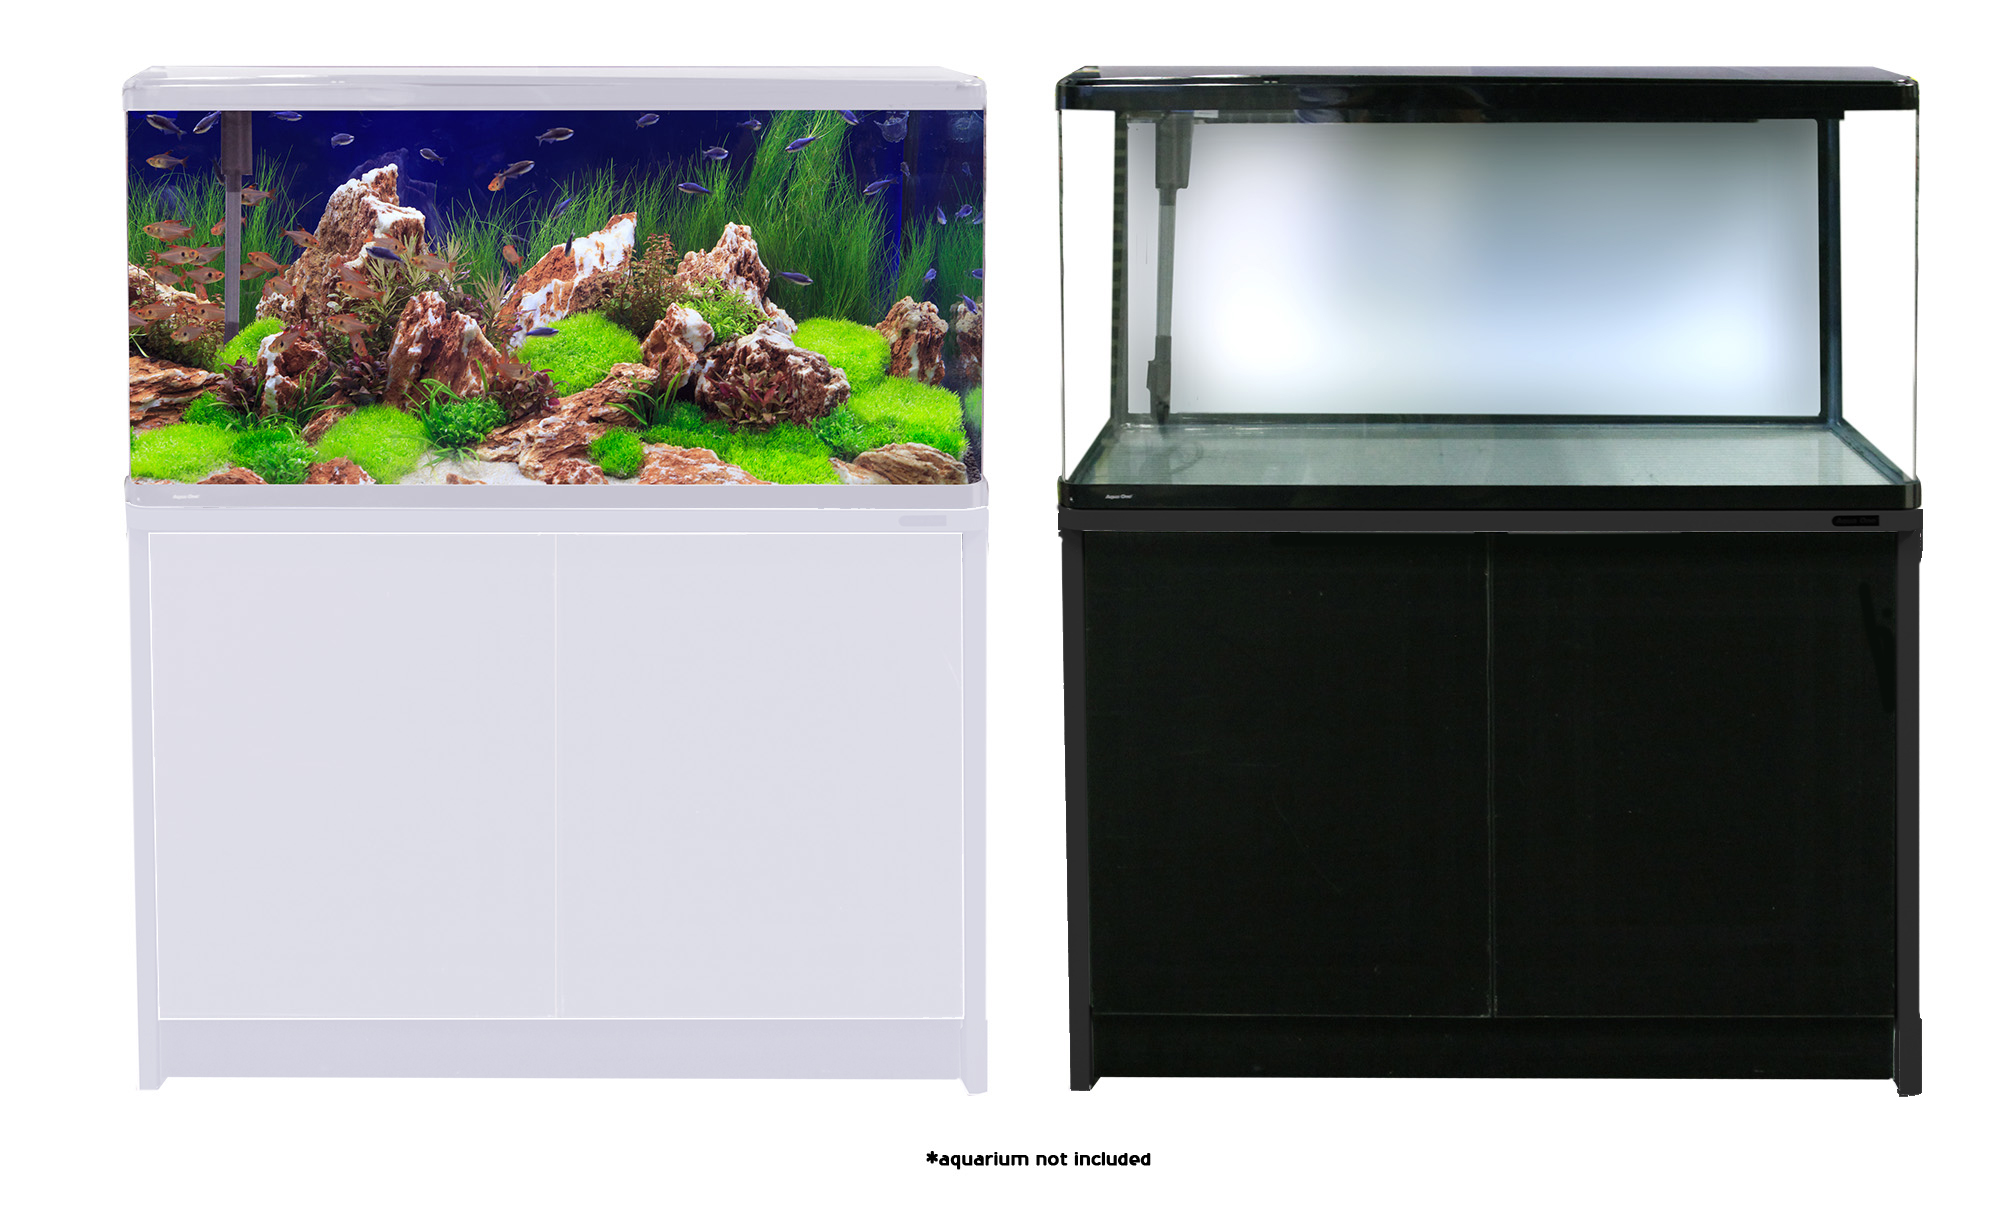 LifeStyle 190 Cabinet